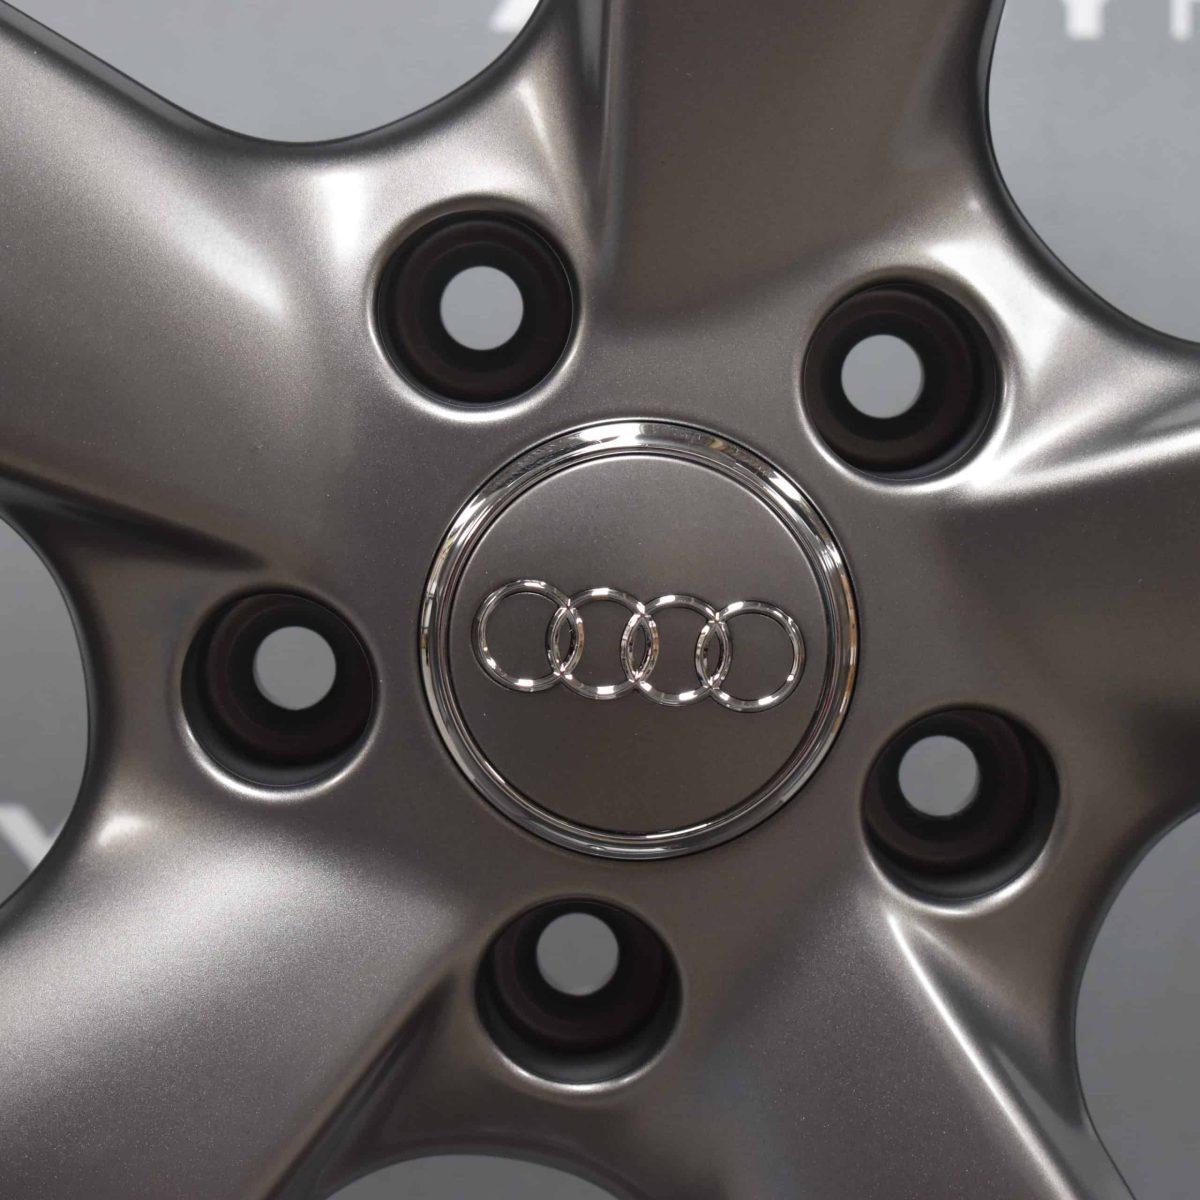 "Genuine Audi Q7 4L 5 Spoke Rotor Arm 21"" Inch Alloy Wheels with Diamond Turned Finish 4L0 601 025 CE"